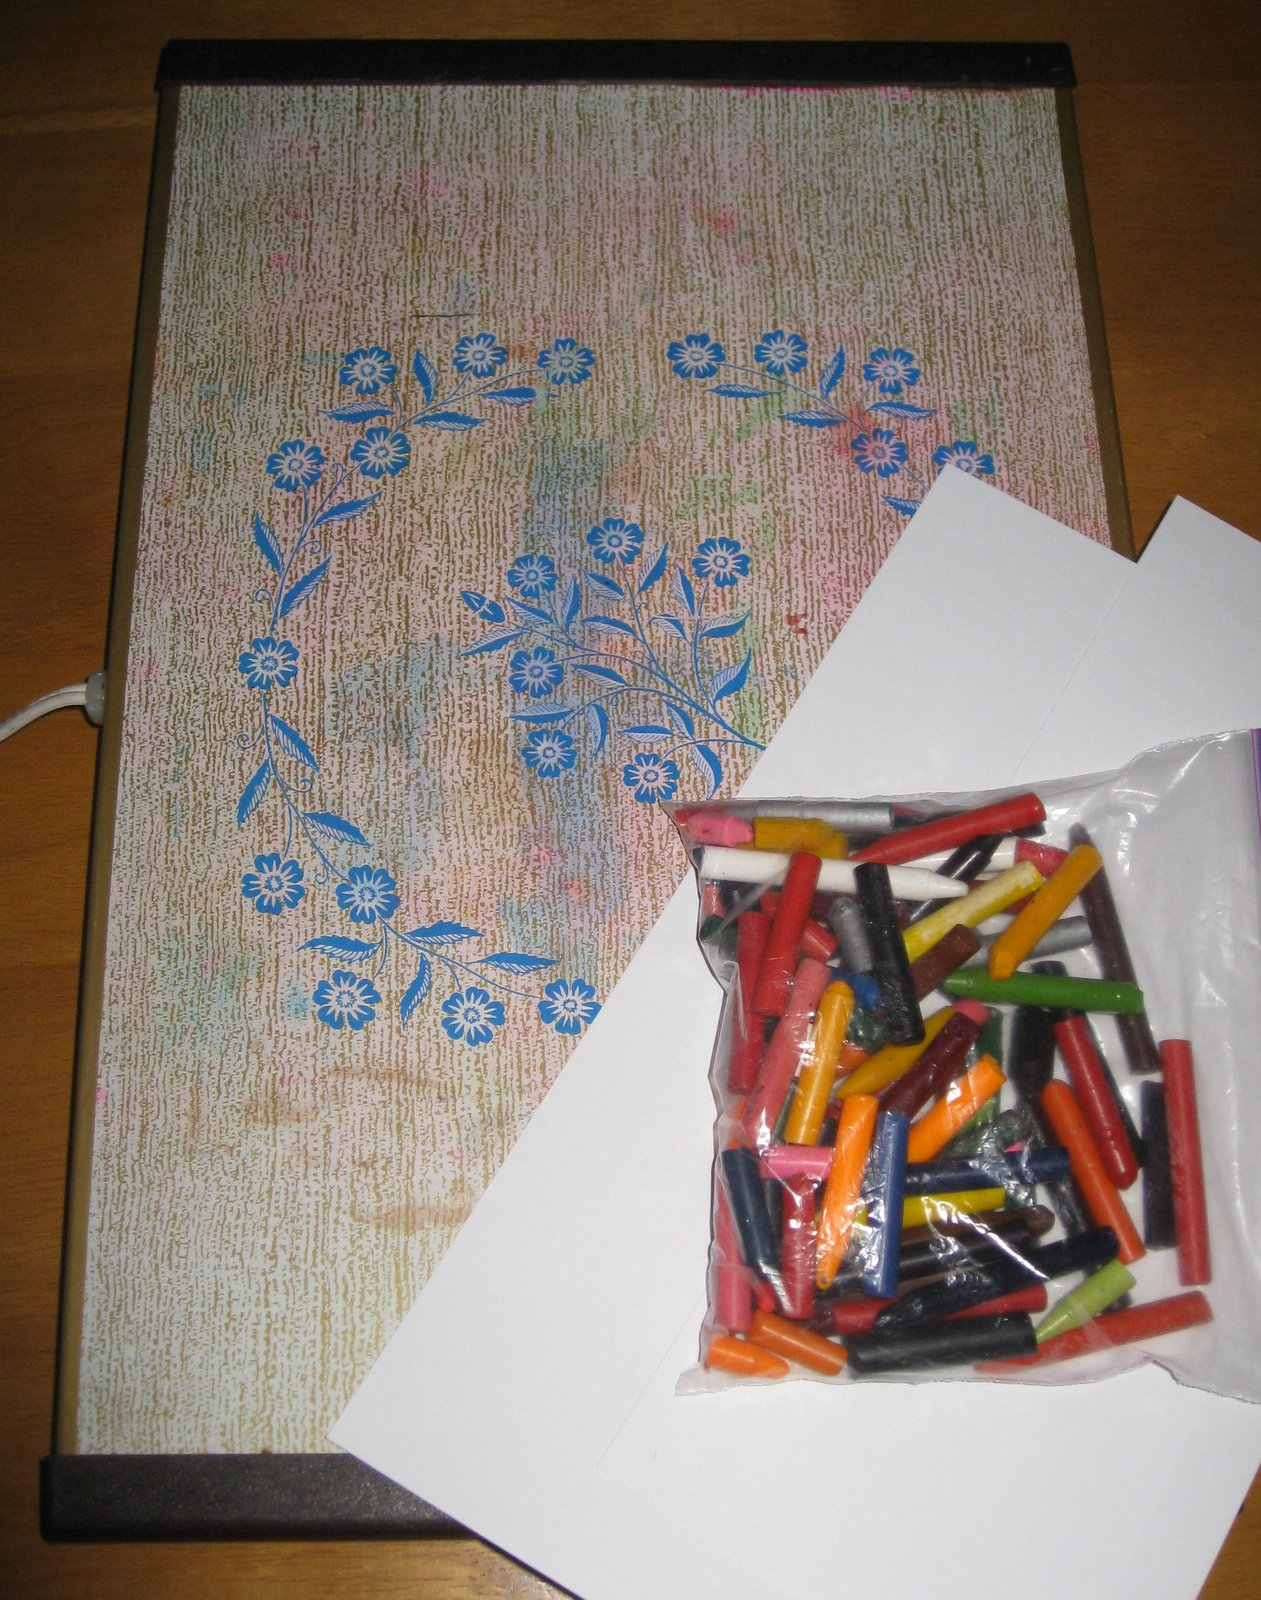 Cindy DeRosier: My Creative Life: Crafting With A Warming Tray